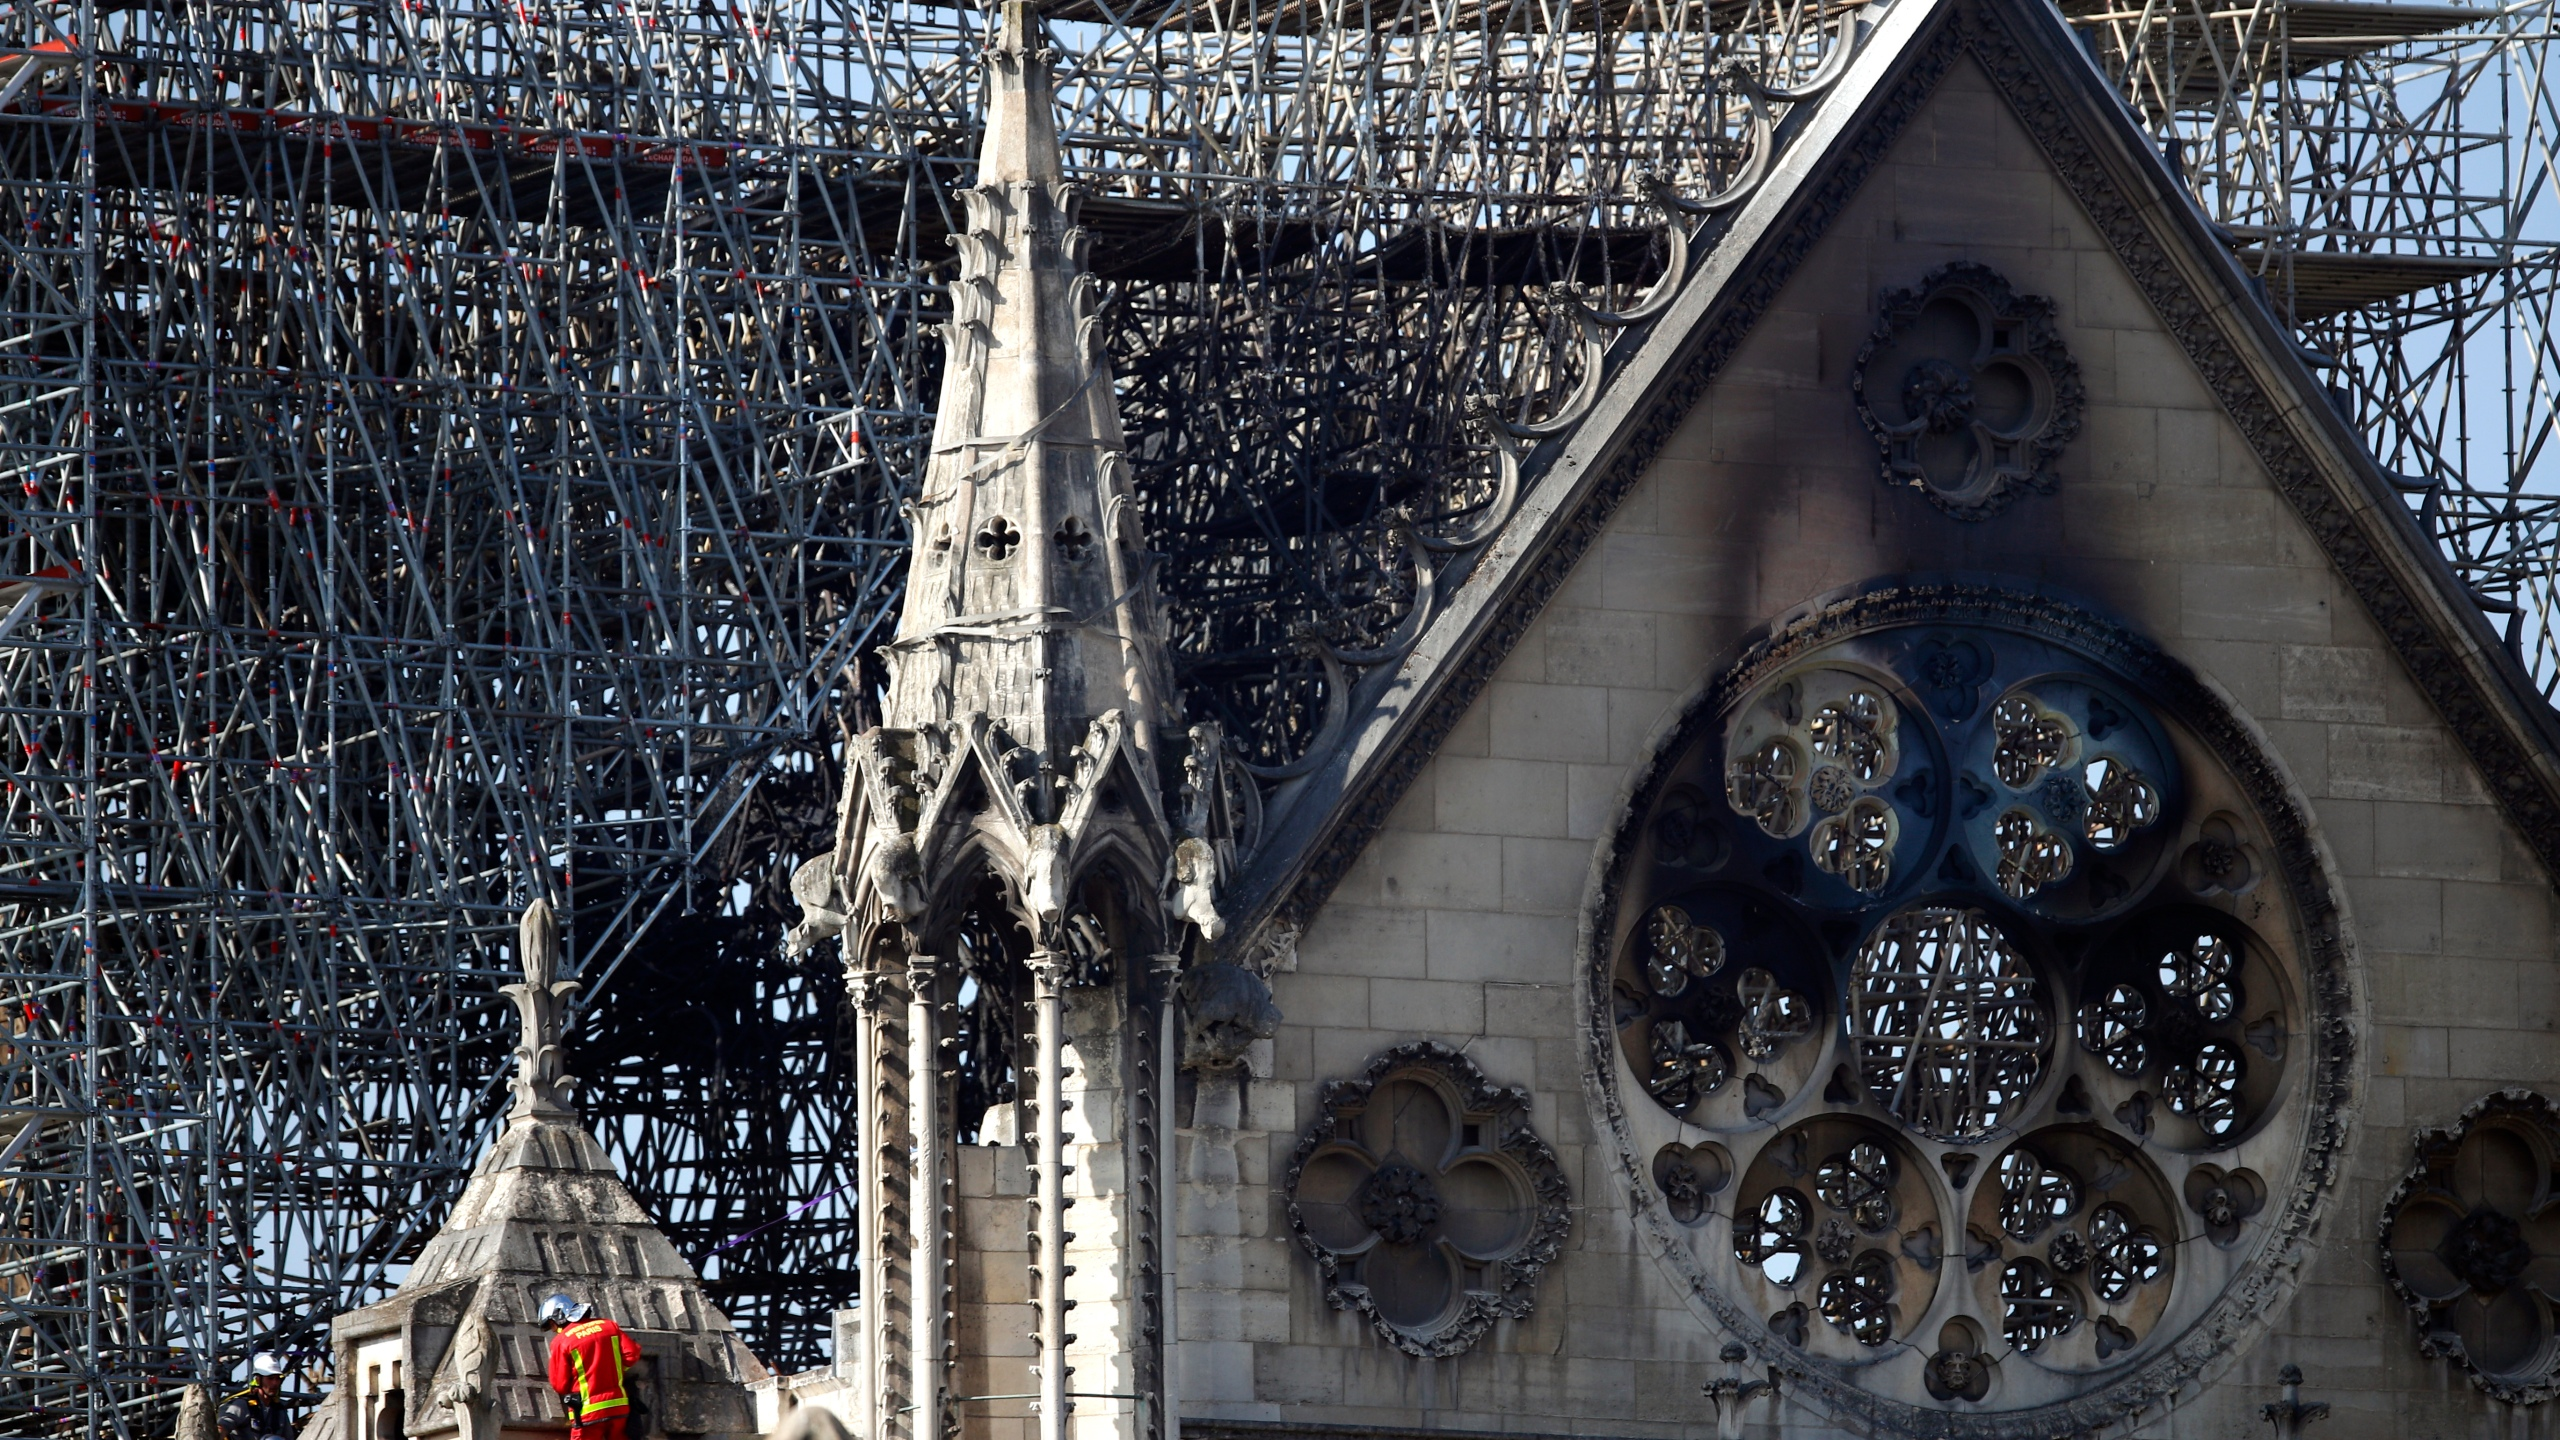 APTOPIX_France_Notre_Dame_Fire_63711-159532.jpg57370092